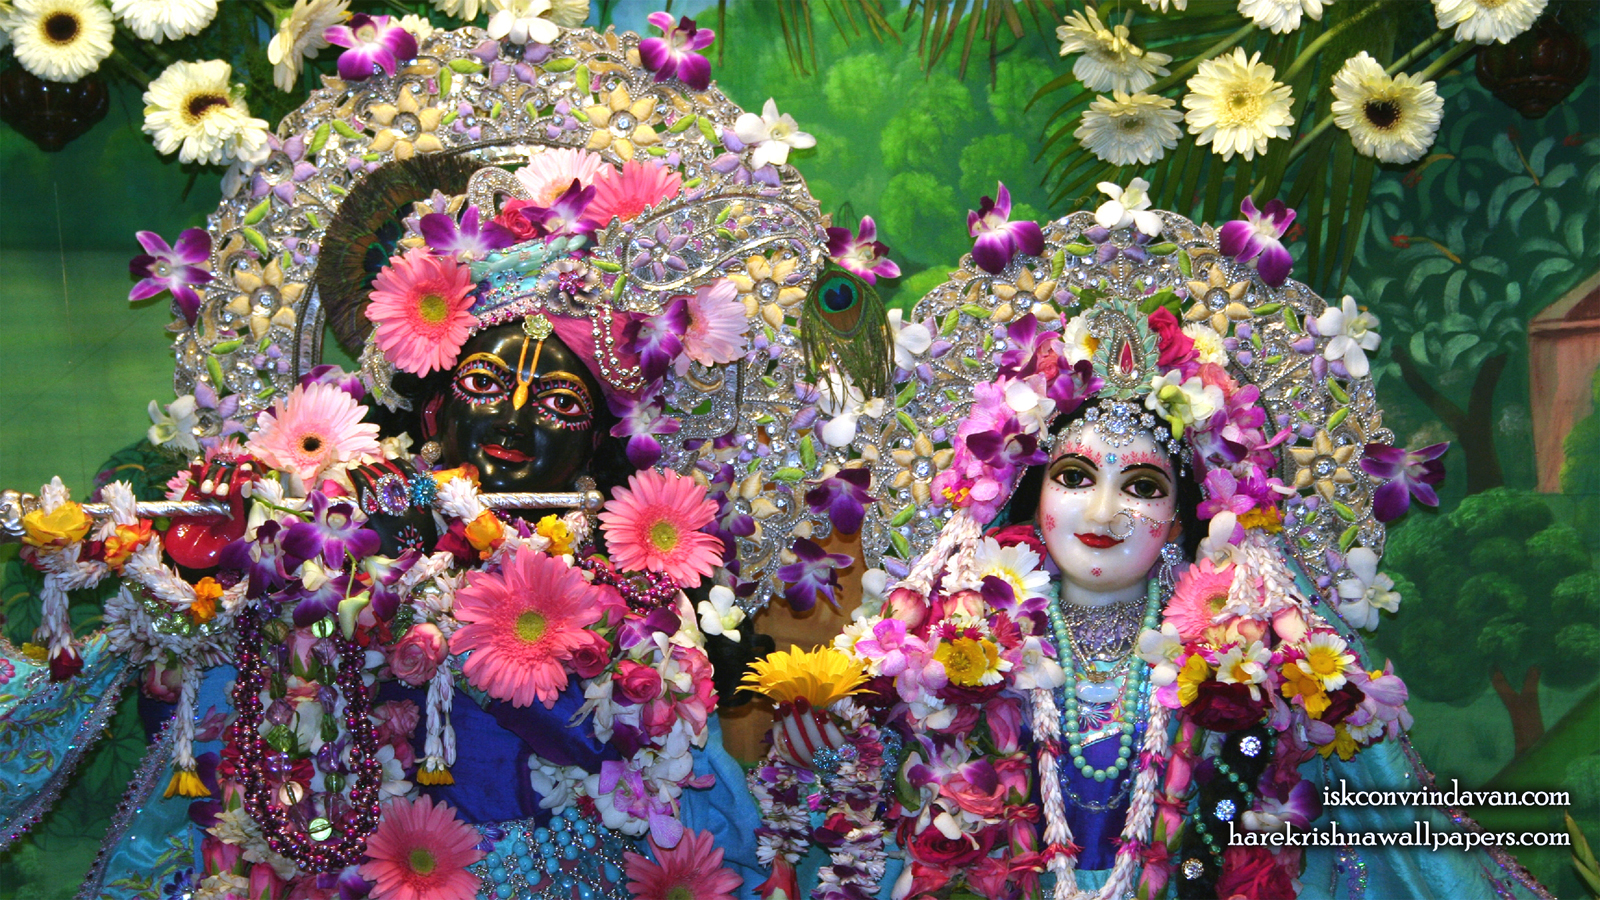 Sri Sri Radha Shyamsundar Close up Wallpaper (001) Size 1600x900 Download